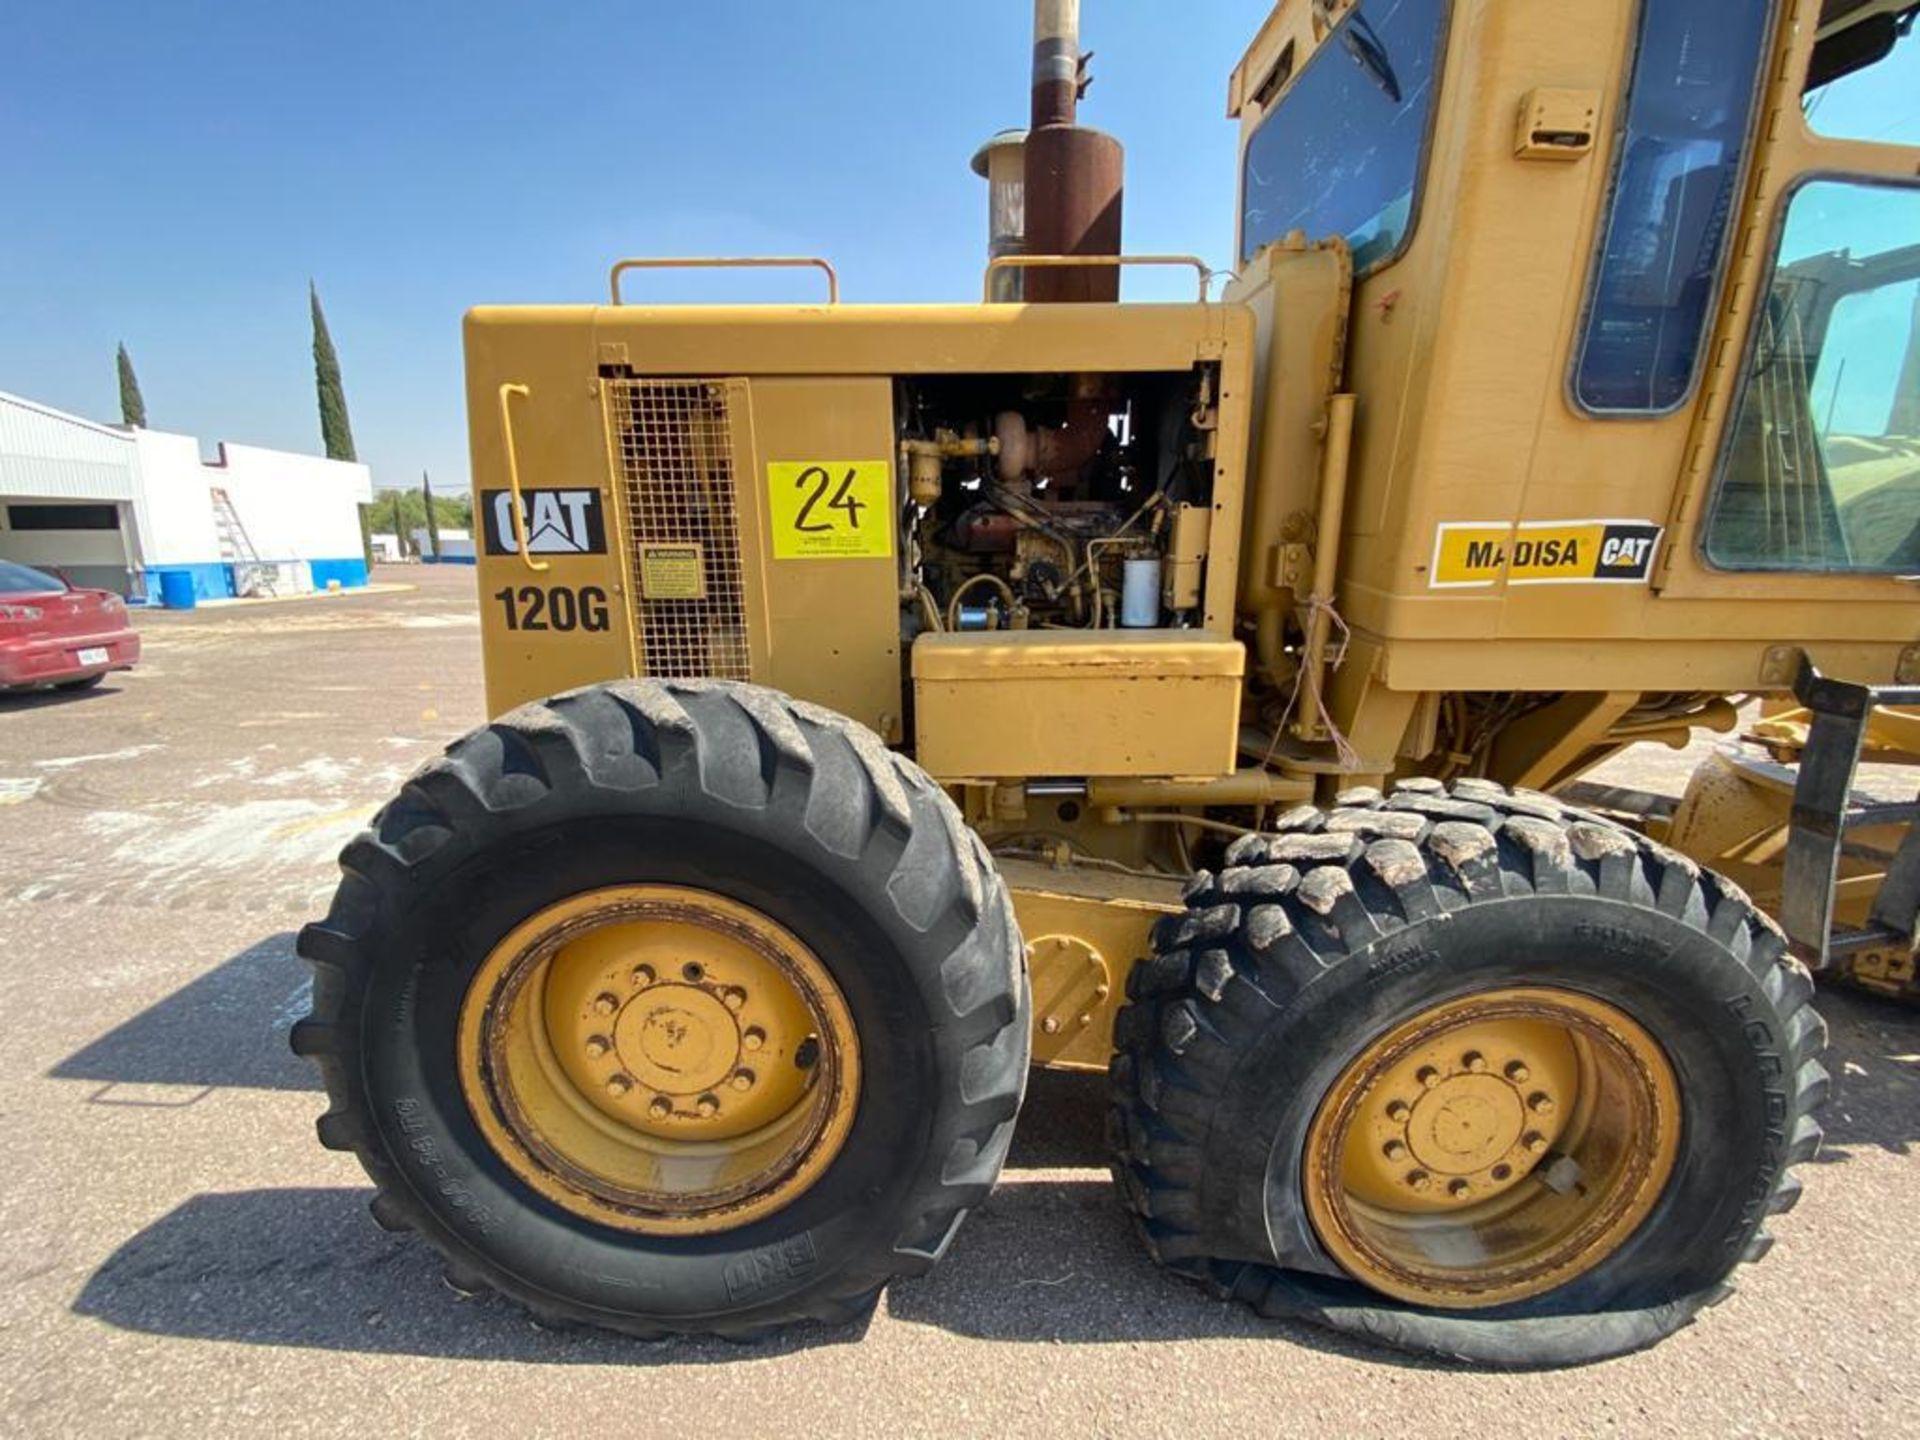 Caterpillar 120G Motor Grader, Serial number 87V09646, Motor number PQ883-2/07Z28983 - Image 51 of 61